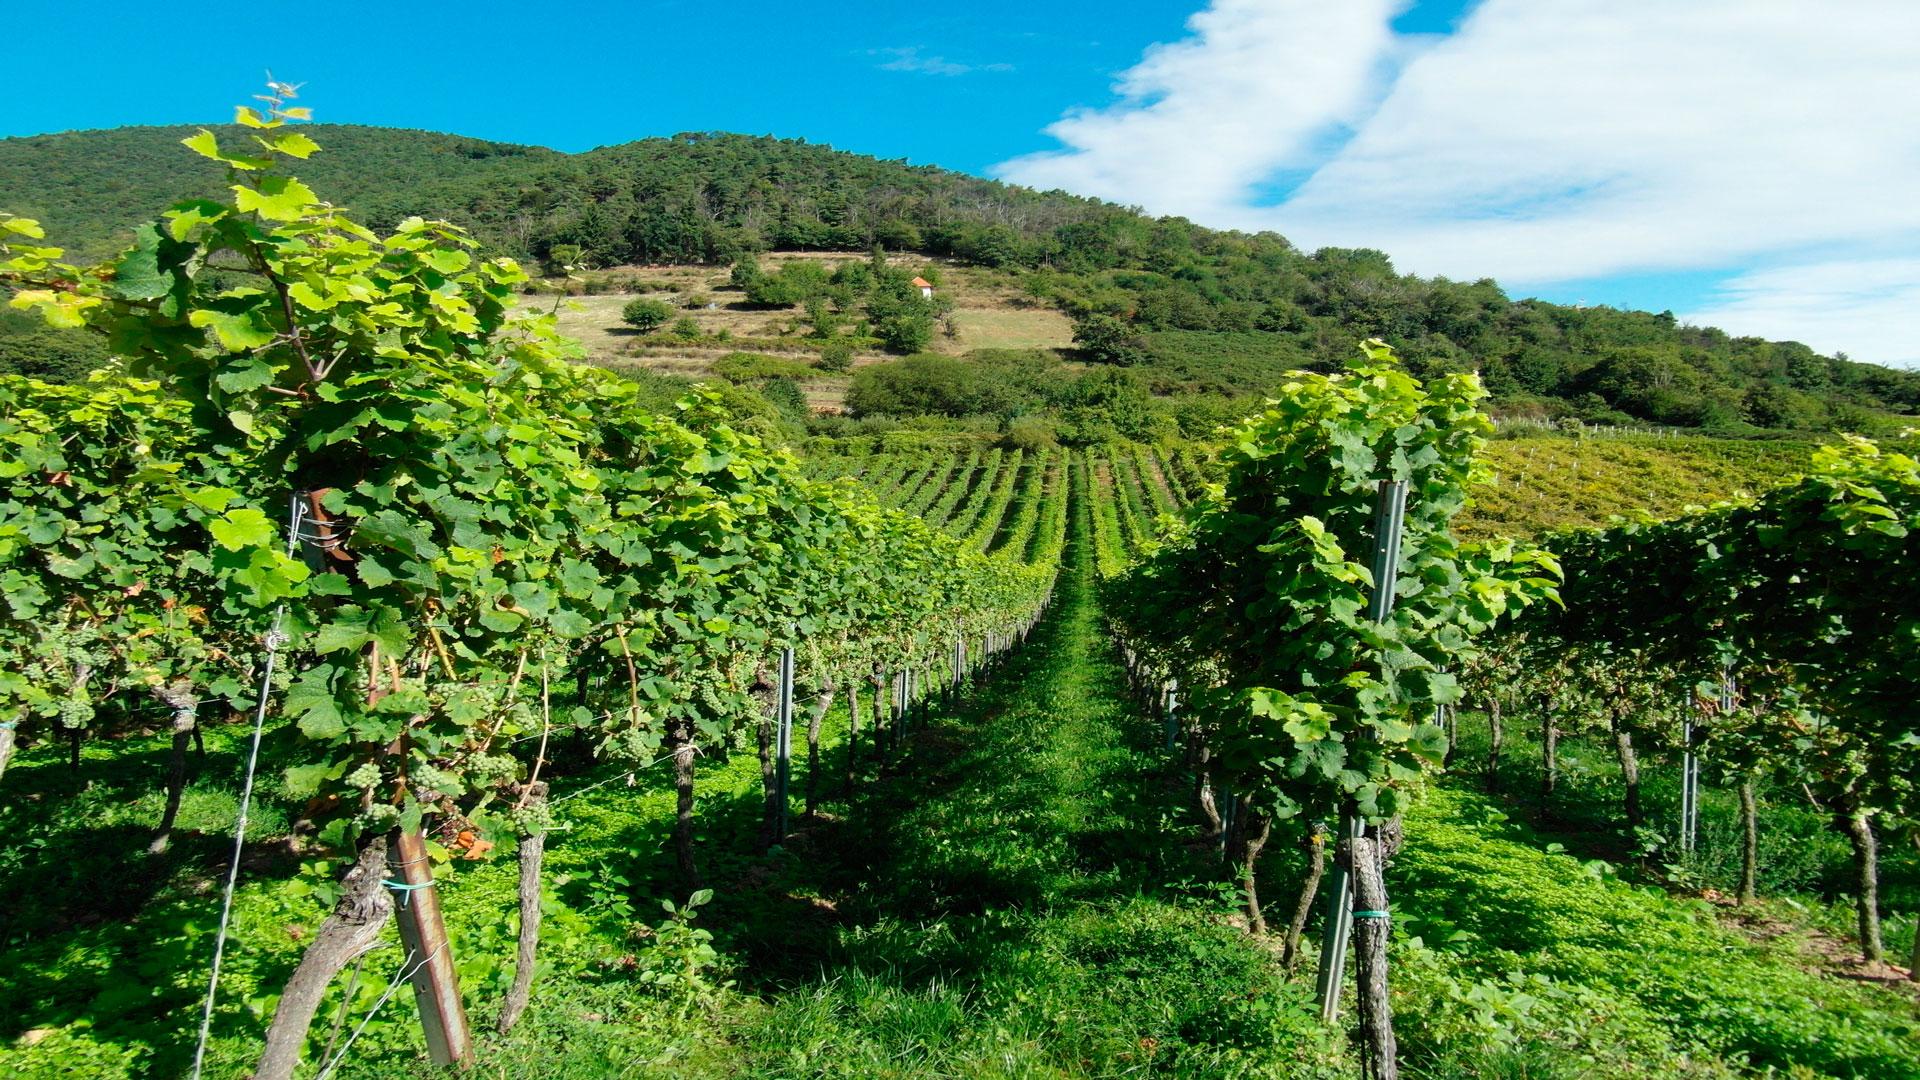 la guardia civil impedira que en galicia entren uvas en la vendimia